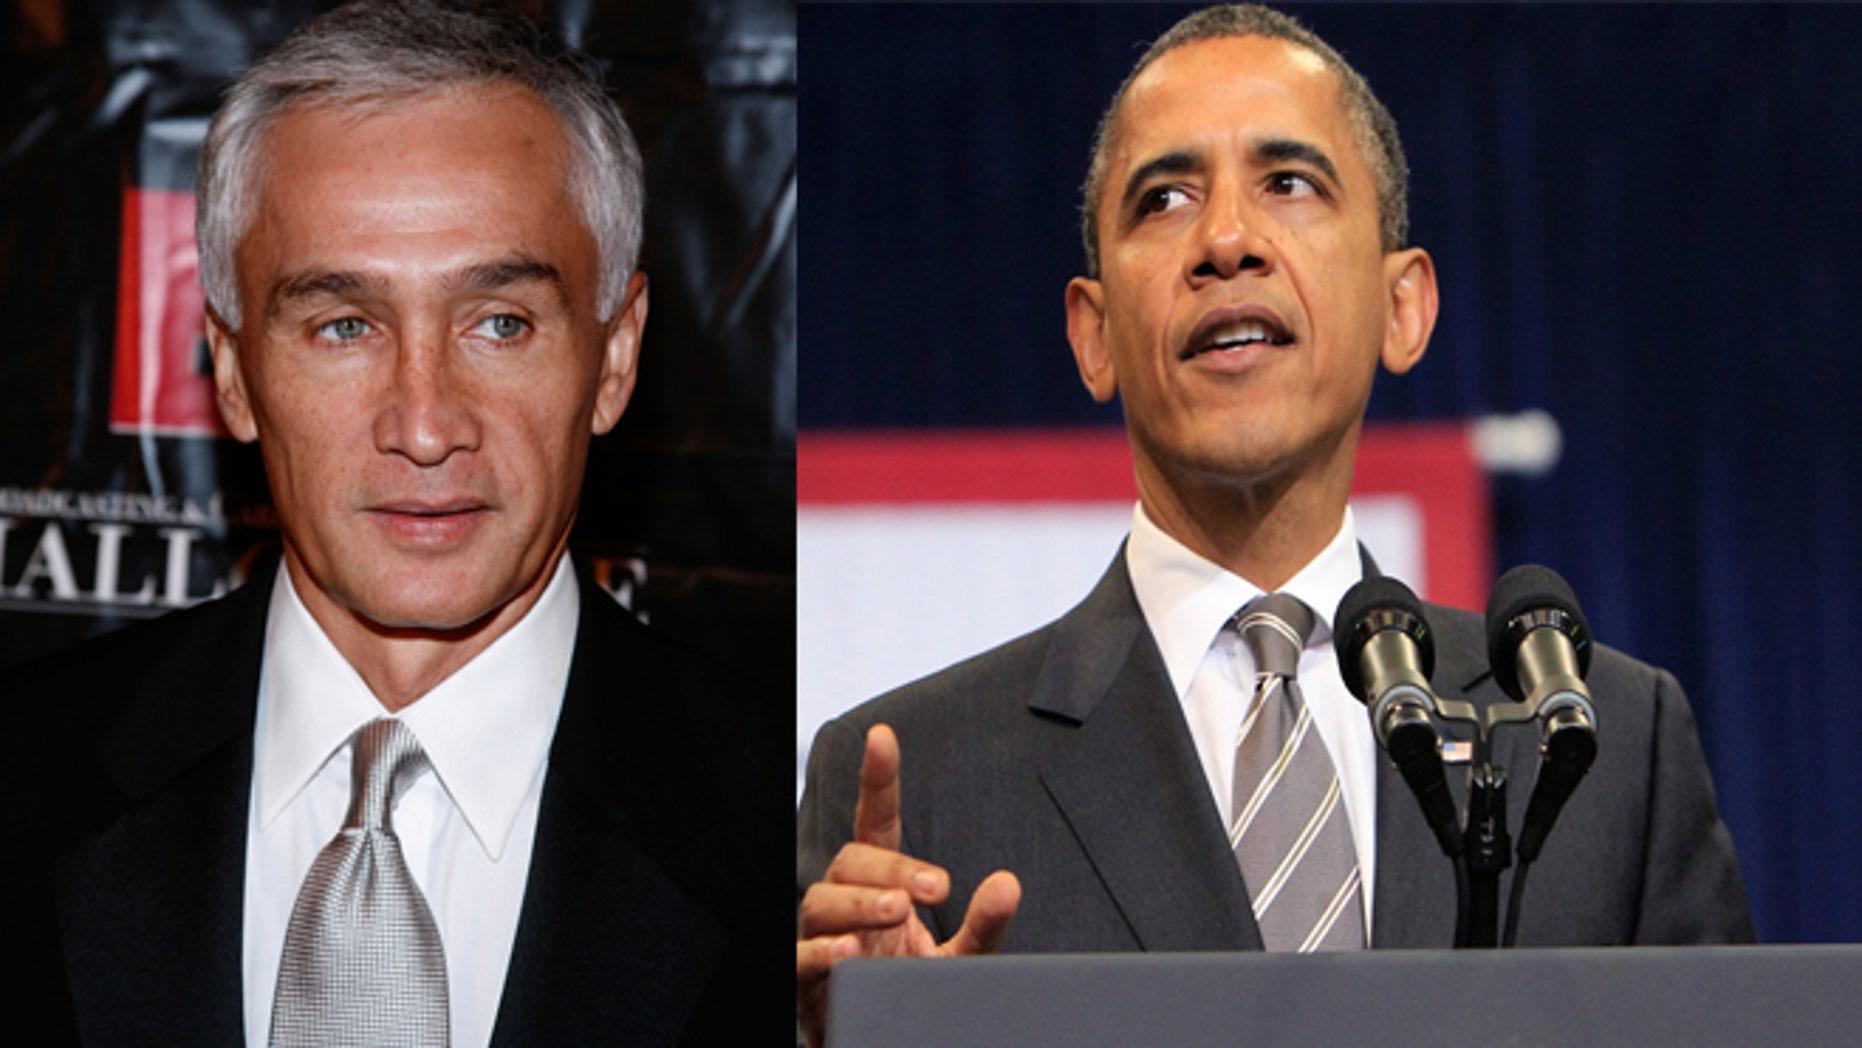 (Left) Jorge Ramos, Univision Anchor, and (Right) President Barack Obama.